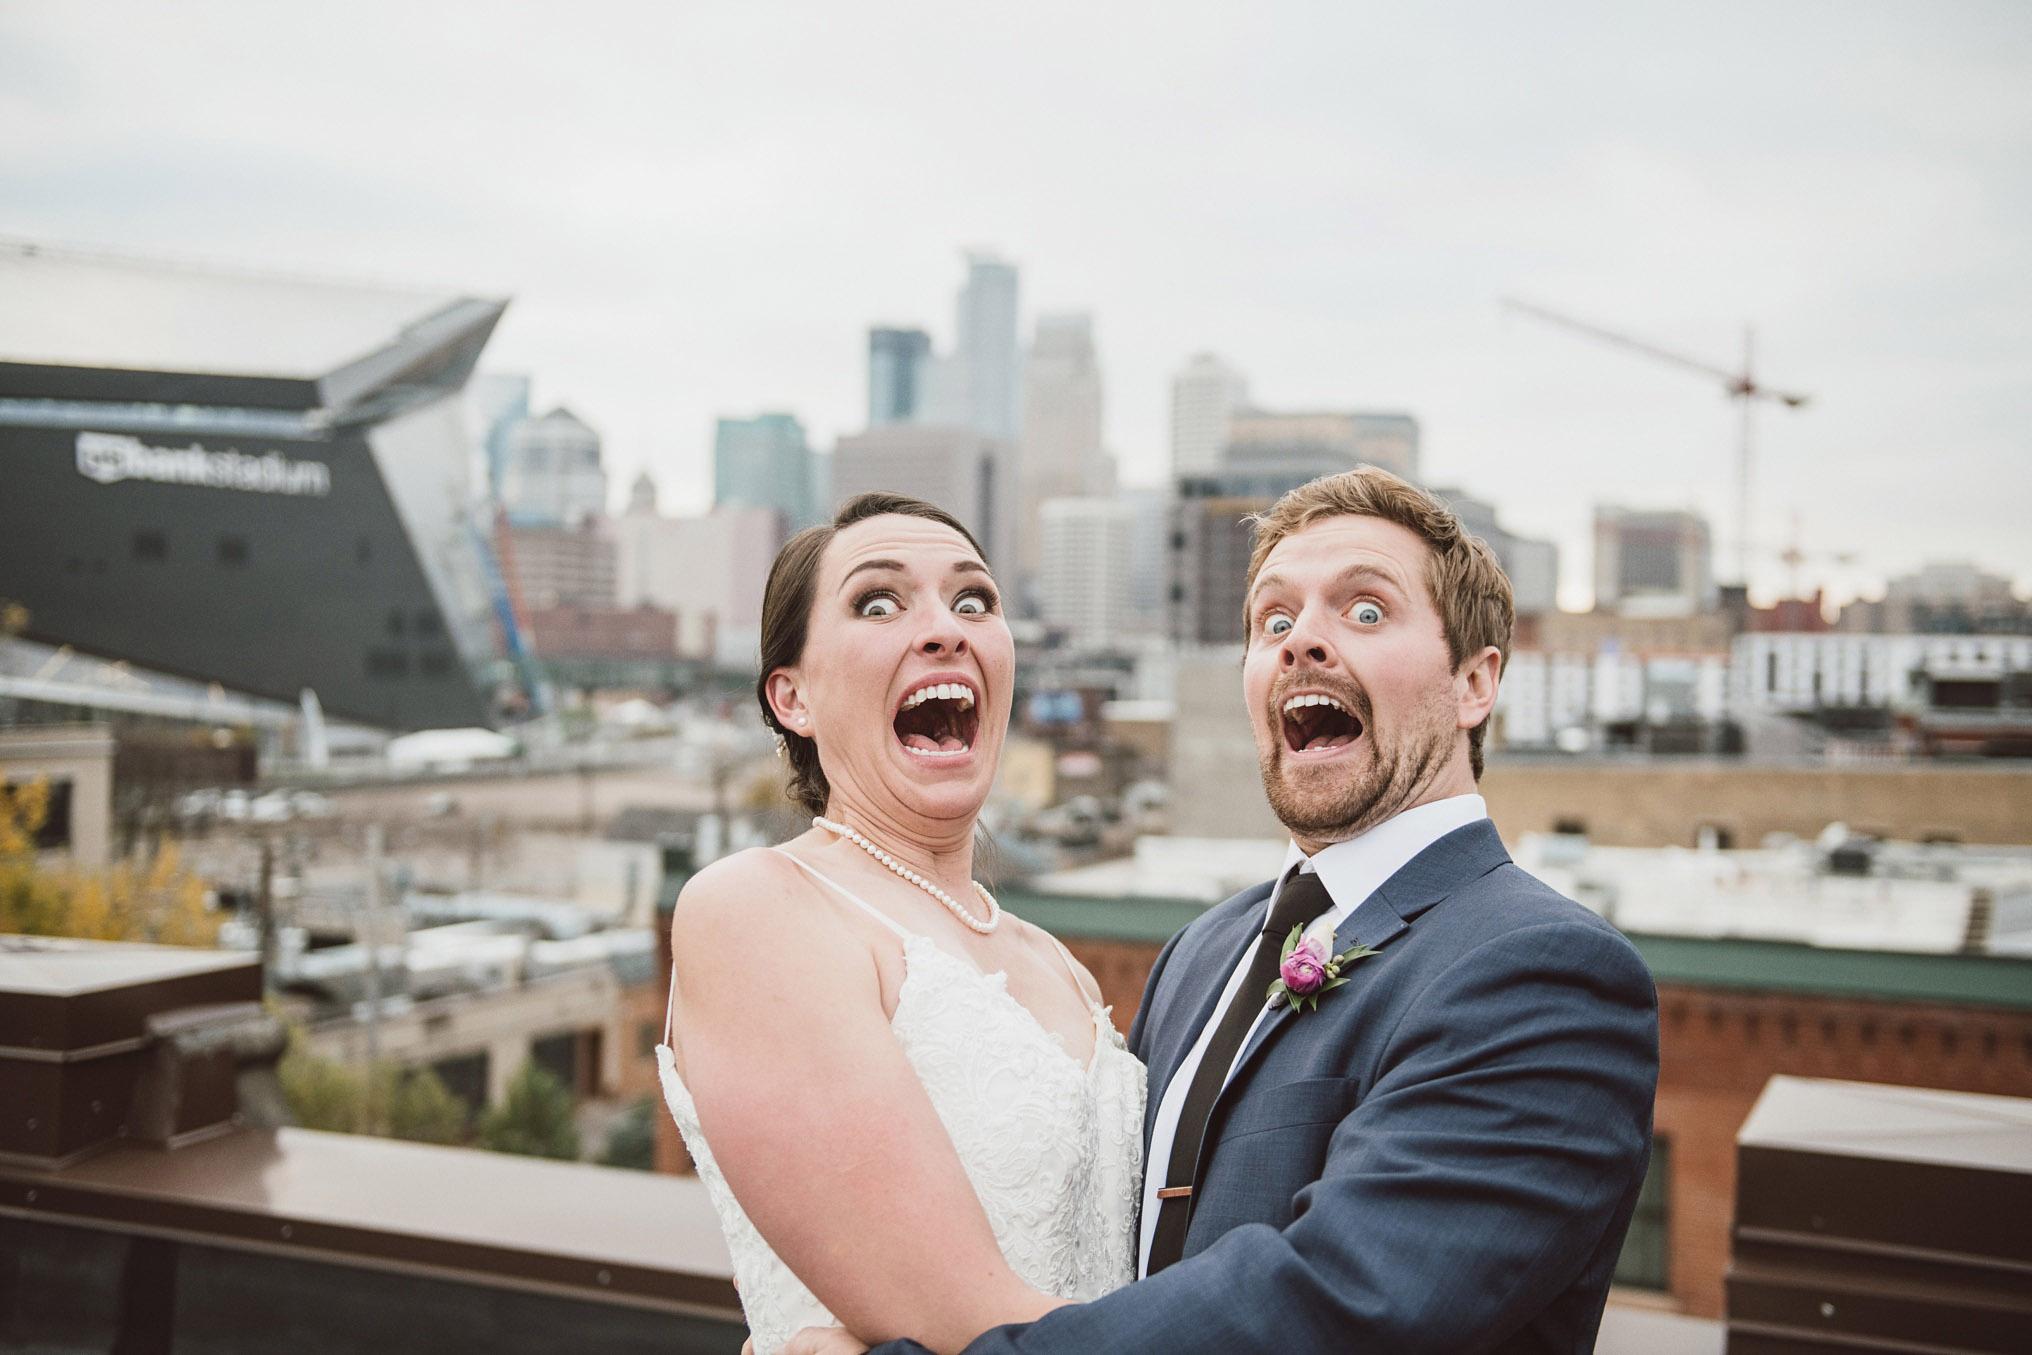 best_wedding_photography_2017_by_lucas_botz_photography_199.jpg